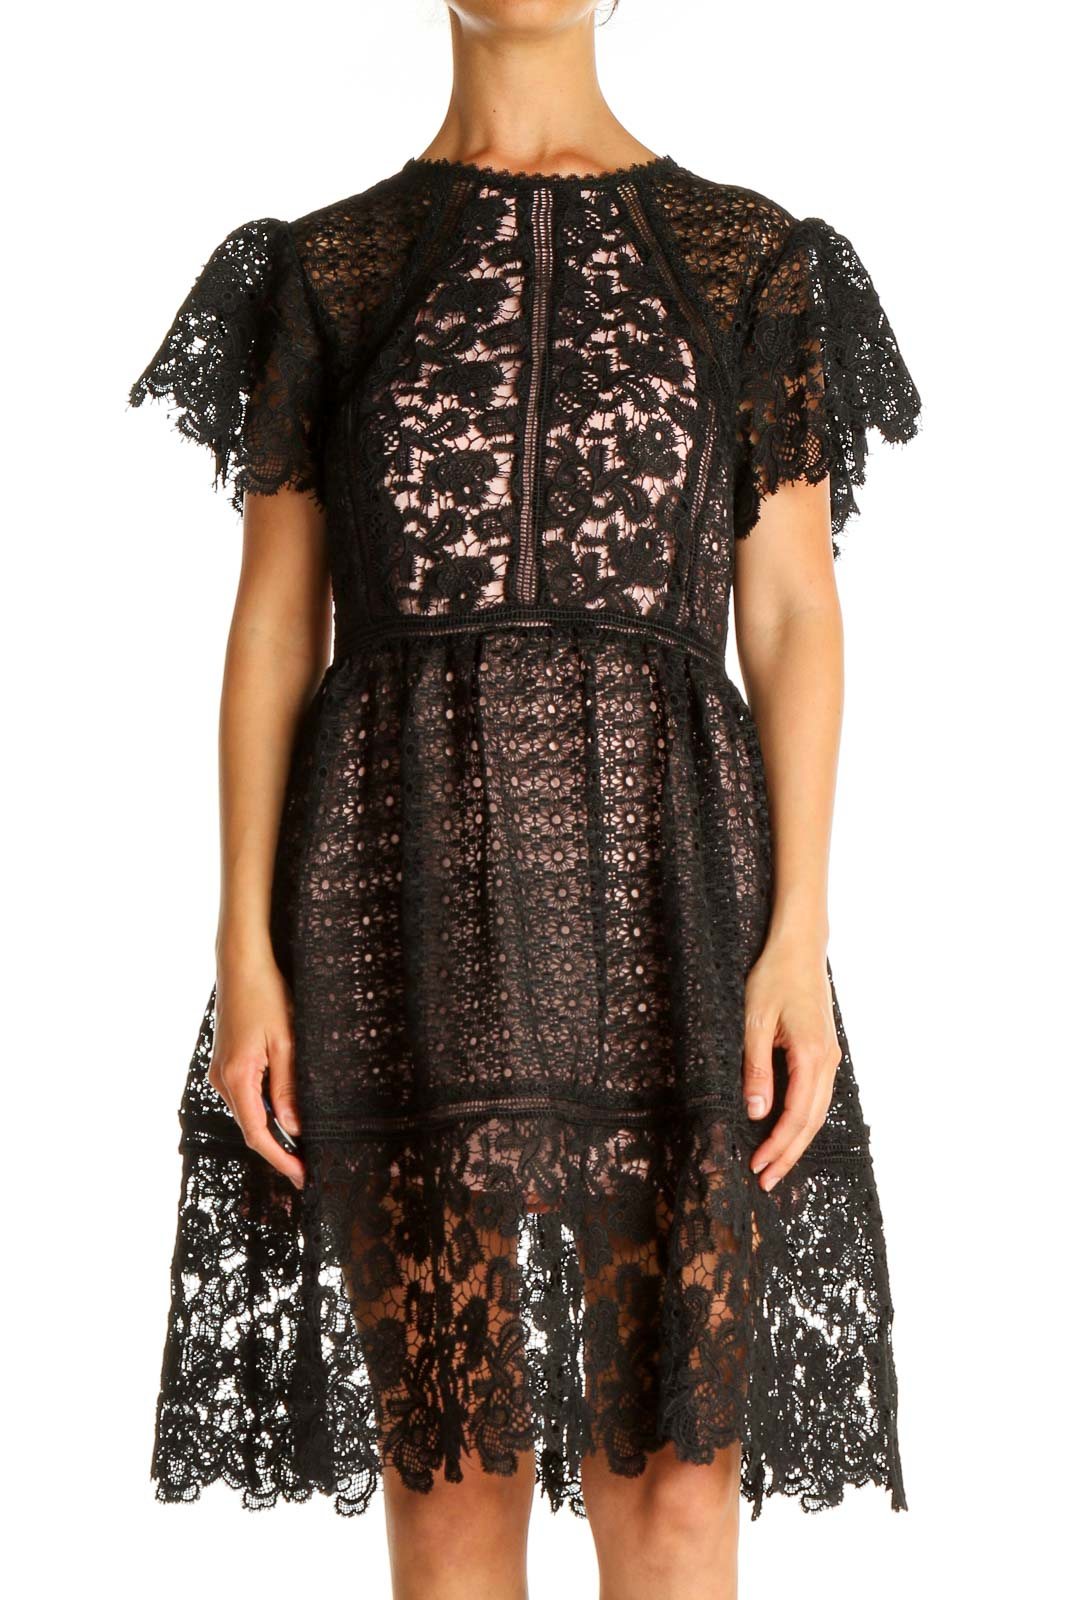 Black Lace Fit & Flare Dress Front